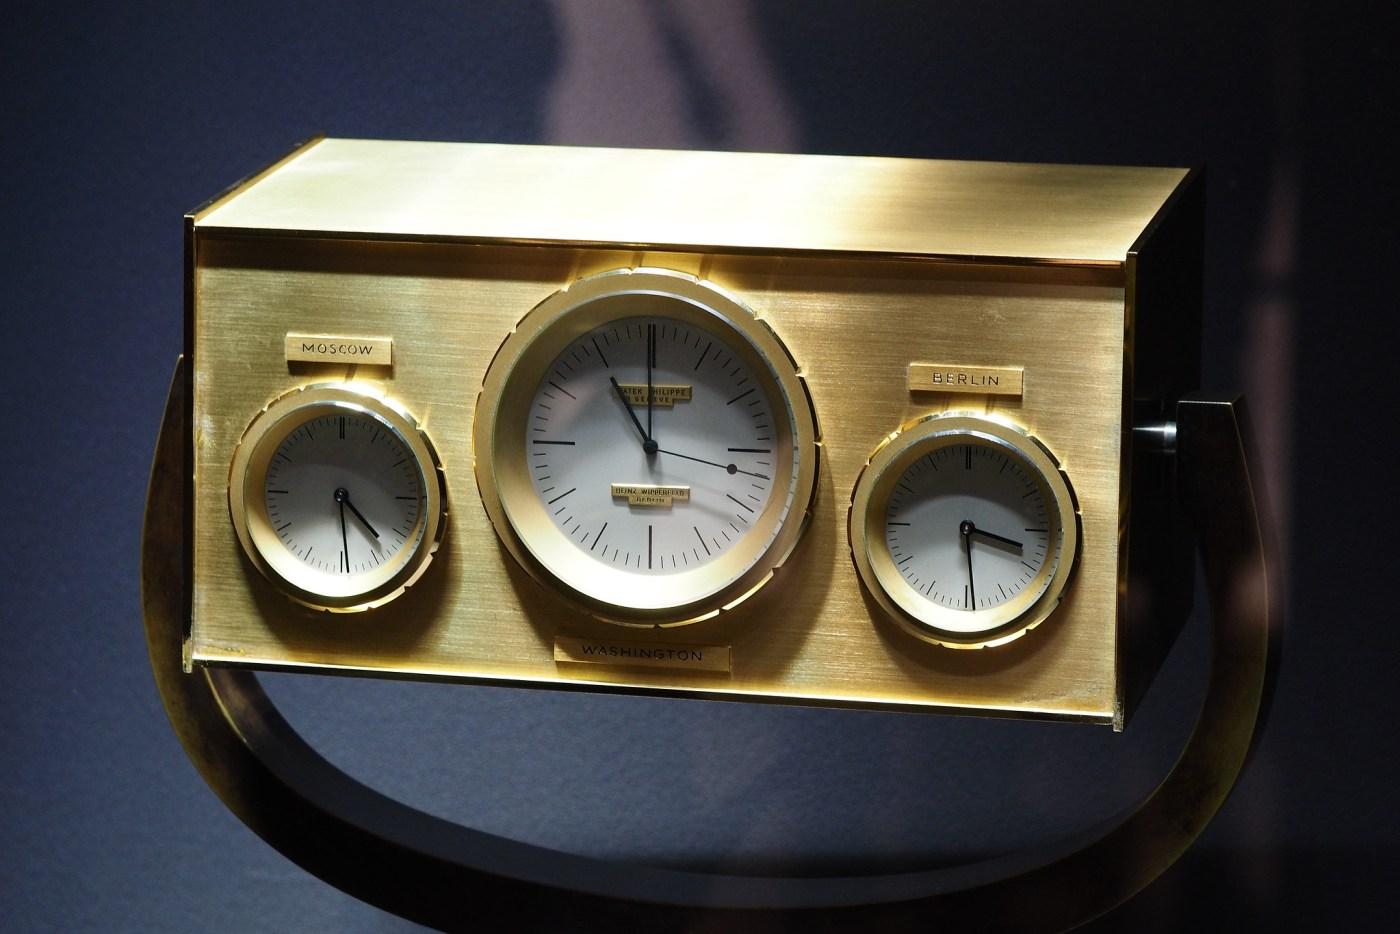 1963 John F. Kennedy clock by Patek Philippe